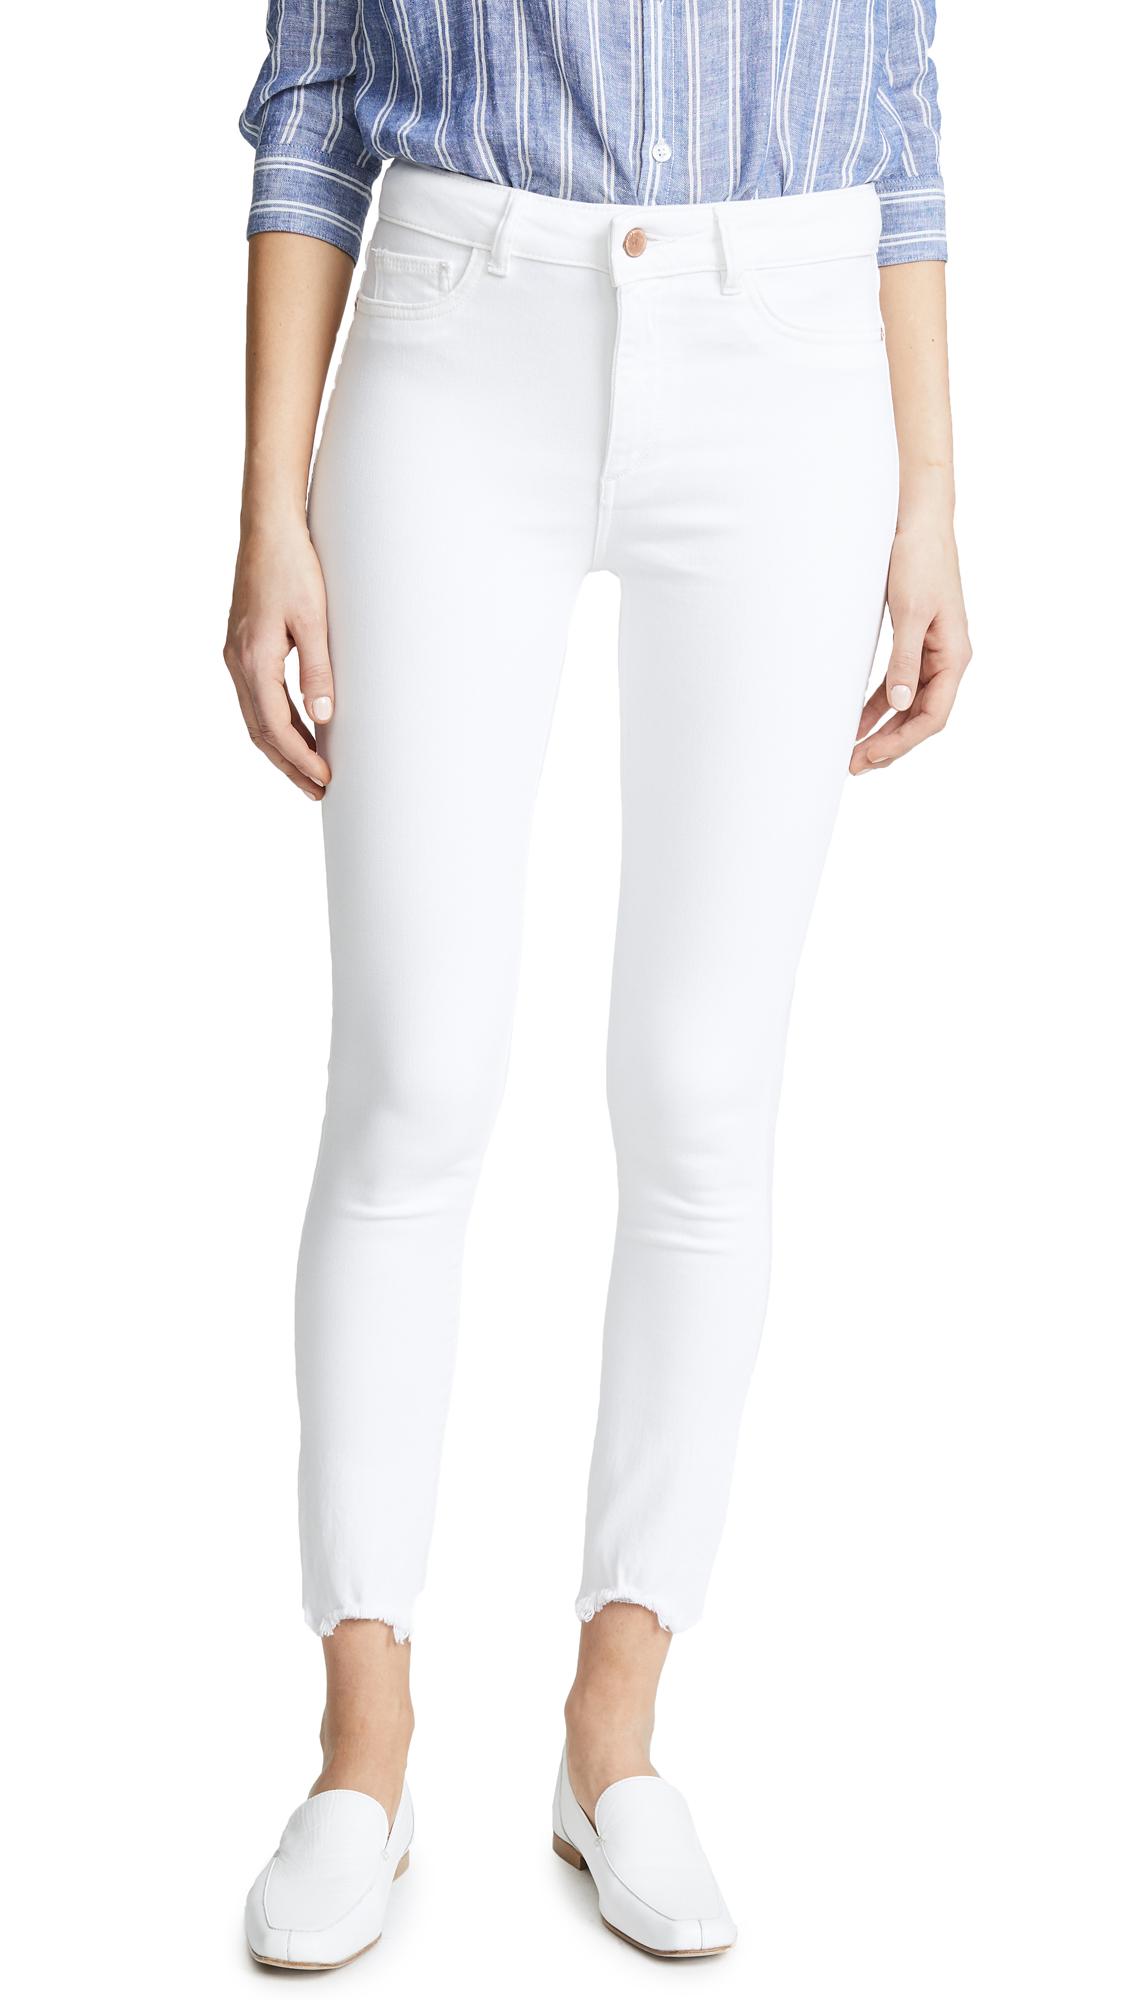 DL1961 Farrow Ankle Instaslim High Rise Skinny Jeans